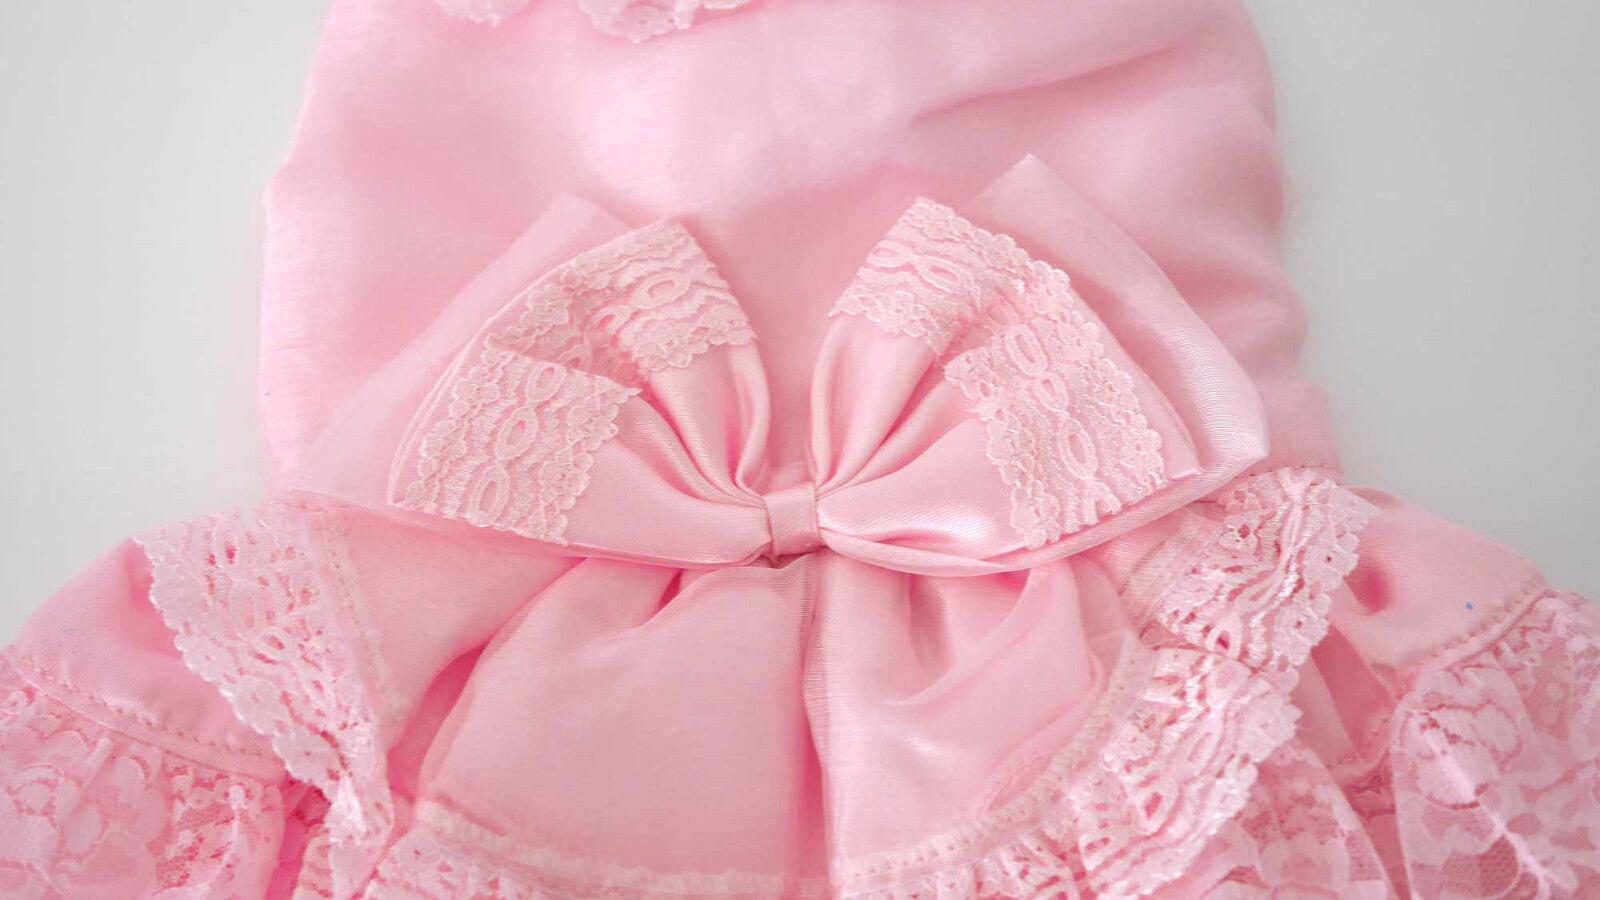 Hundekleid Brautkleid Party Wedding Rosa Spitze Schleife Schleife Schleife GR XS, S und M - KLEID   | Schöne Kunst  220b6b